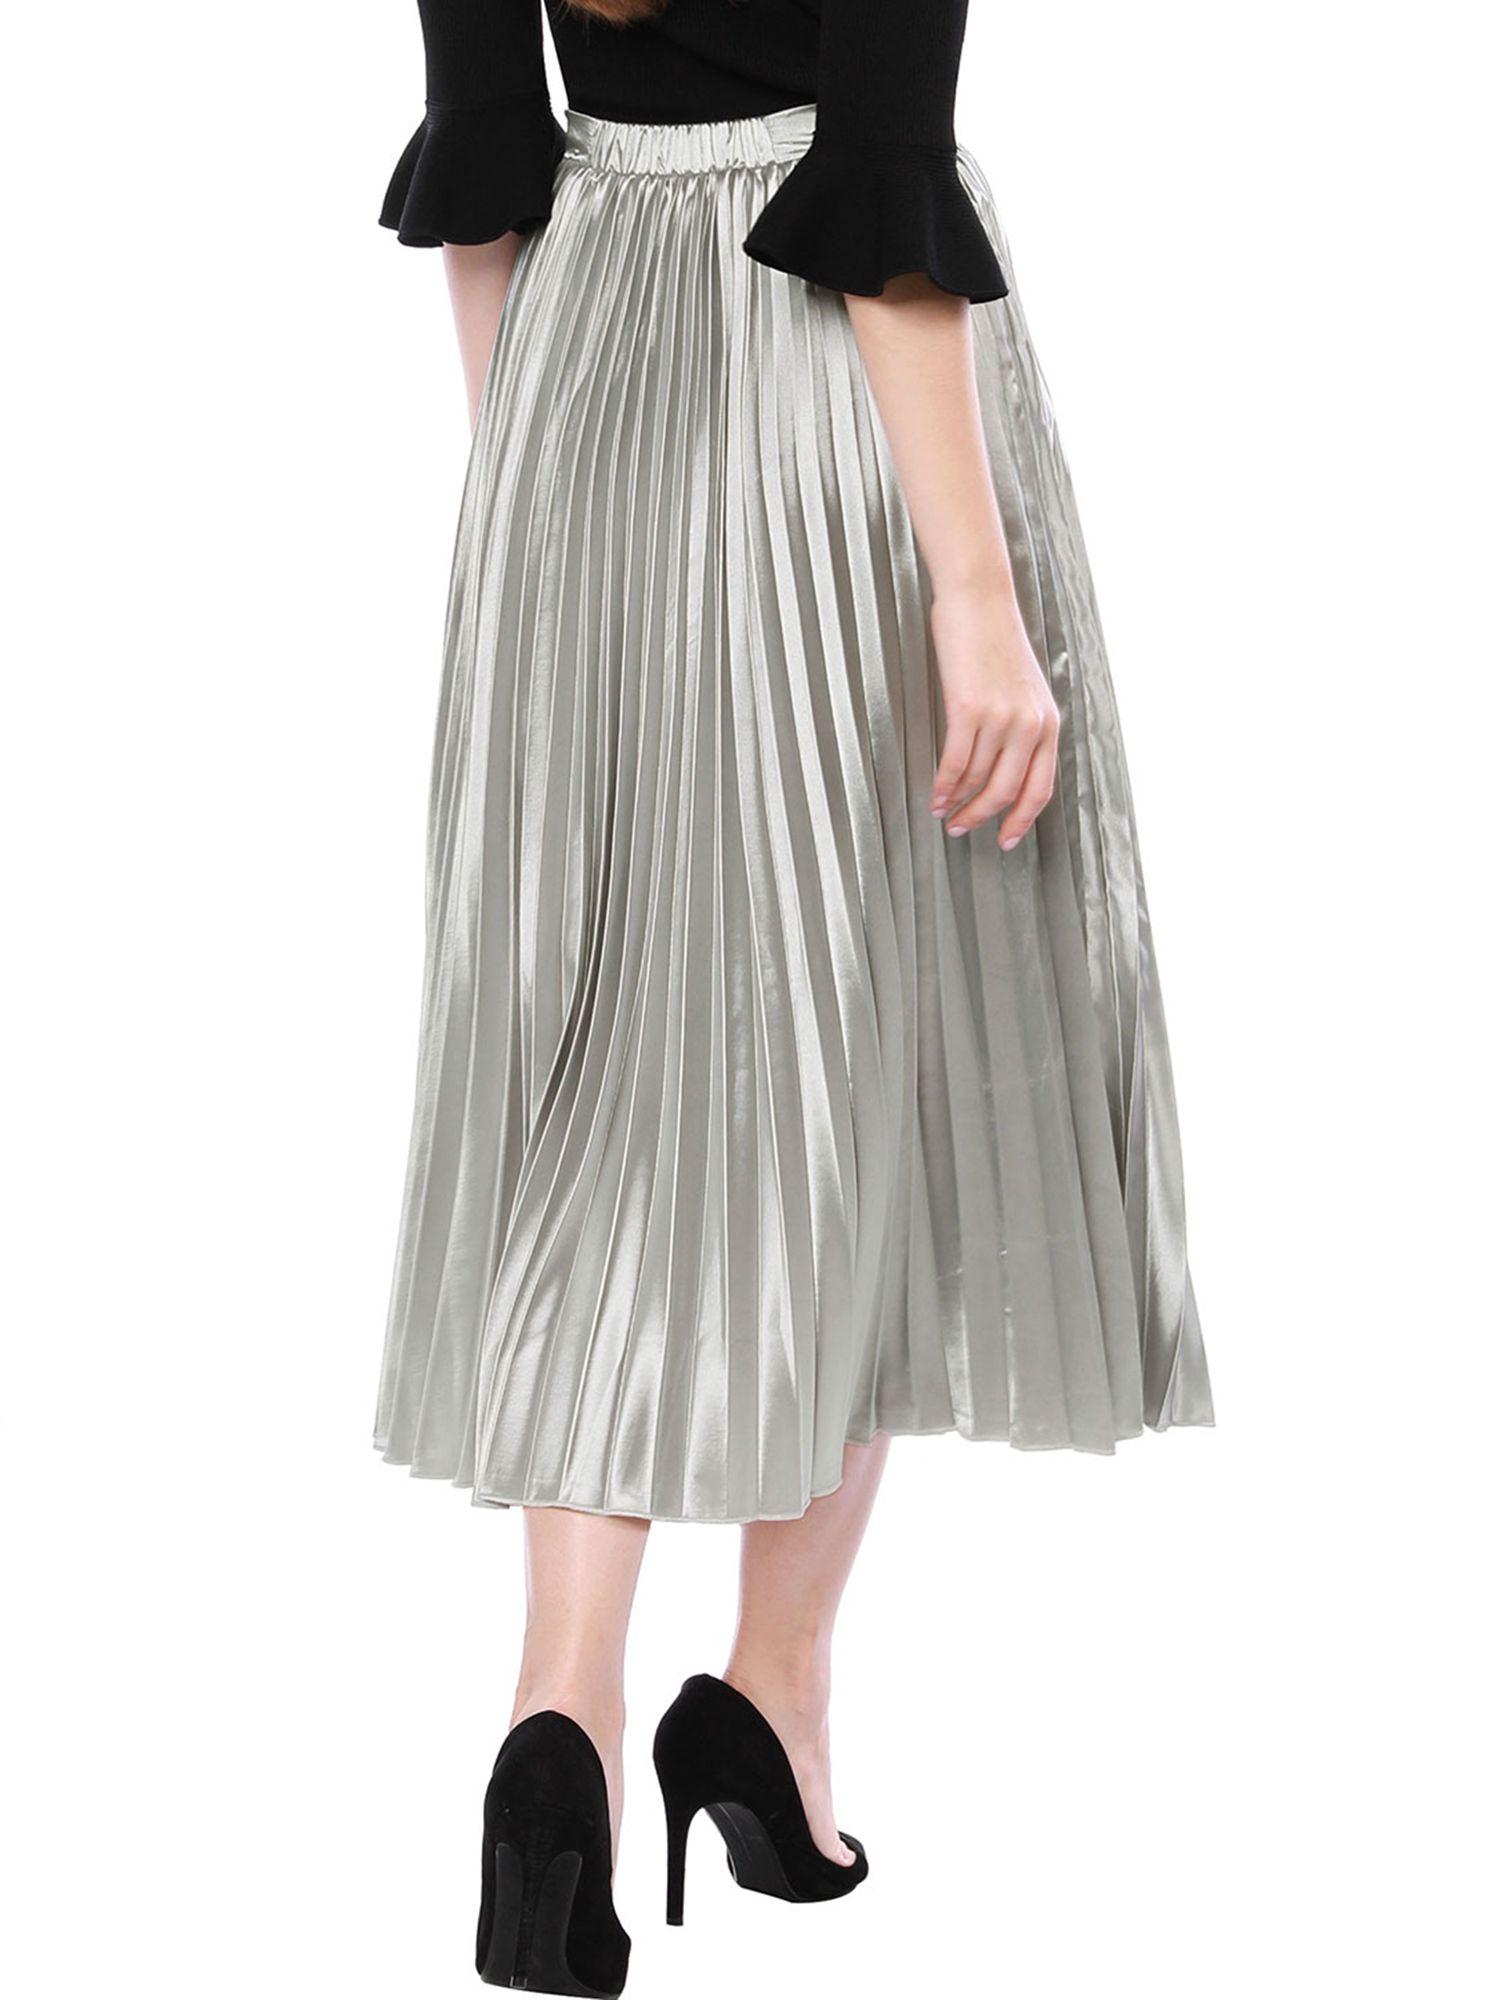 6965c3886 Women's High Waist Party Accordion Pleats Metallic Midi Skirt Dress#Party,  #Accordion, #Waist